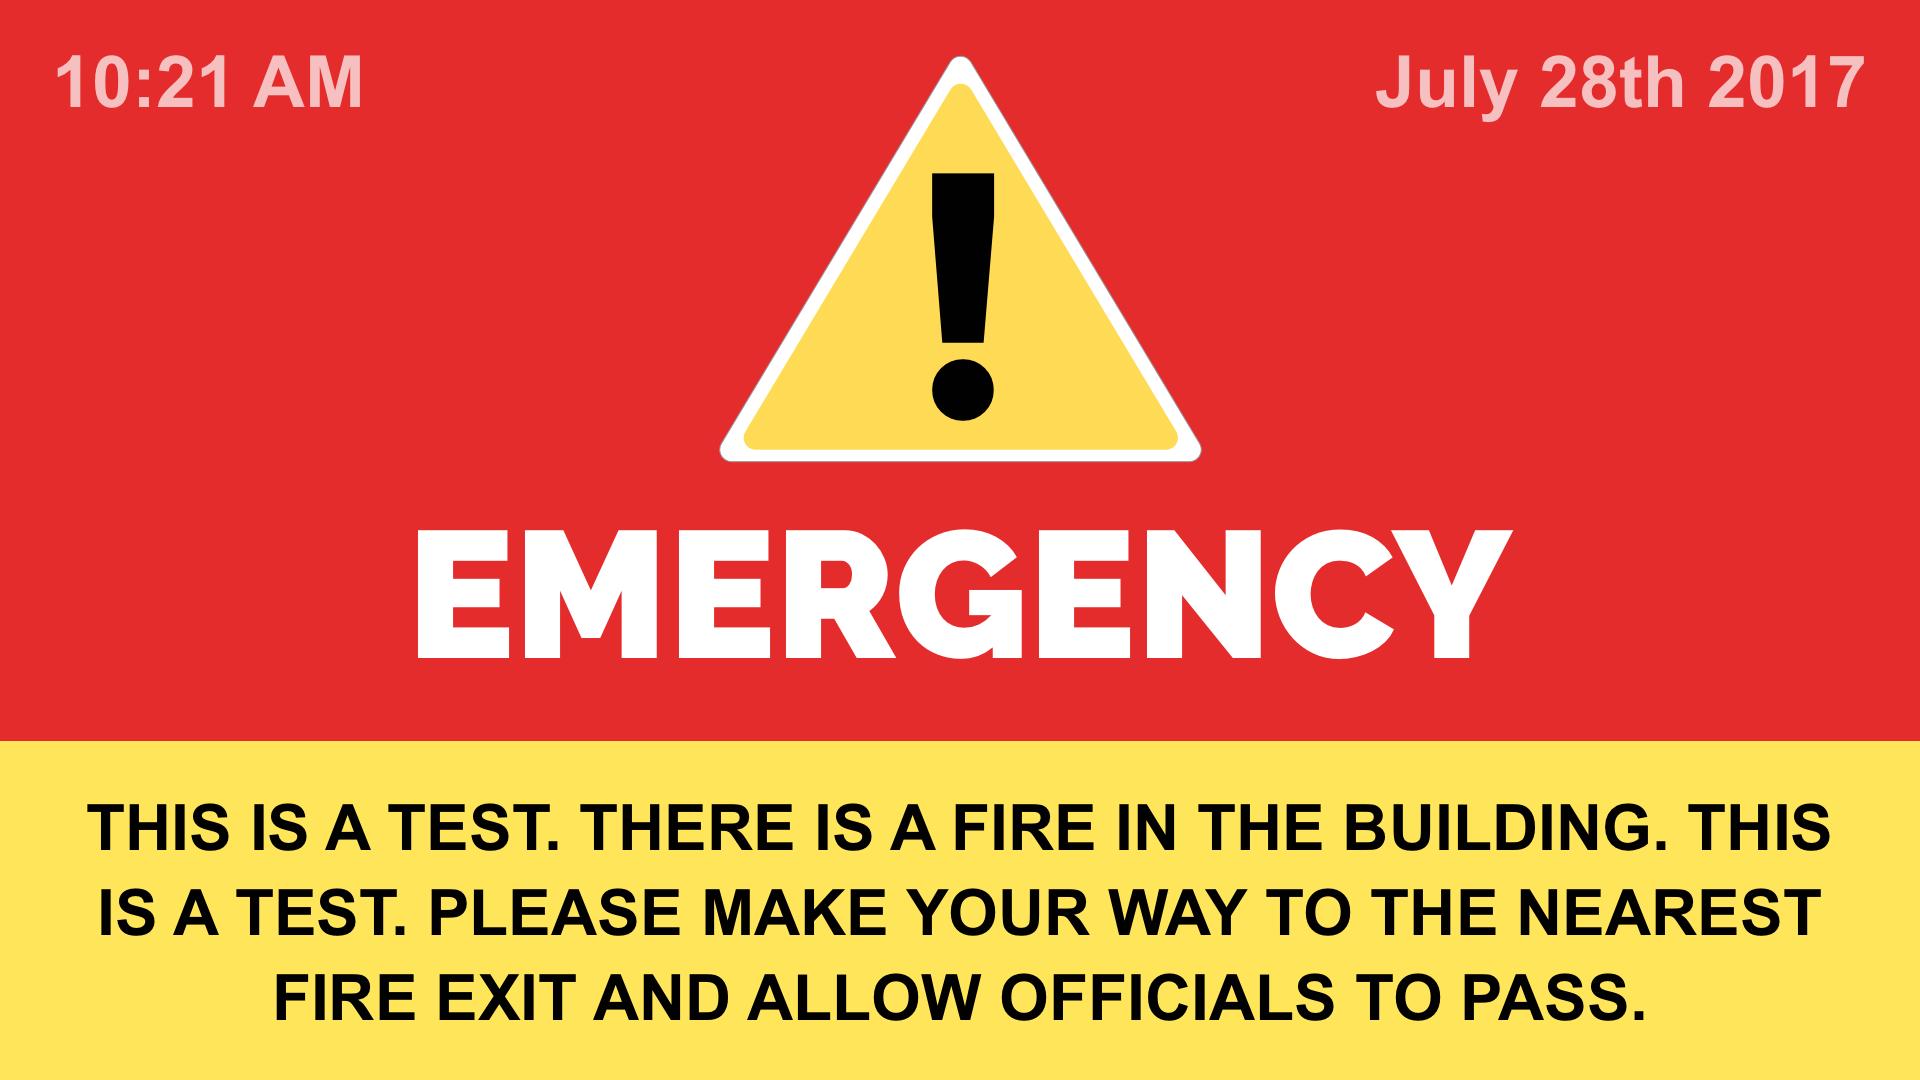 Emergency Digital Signage Template